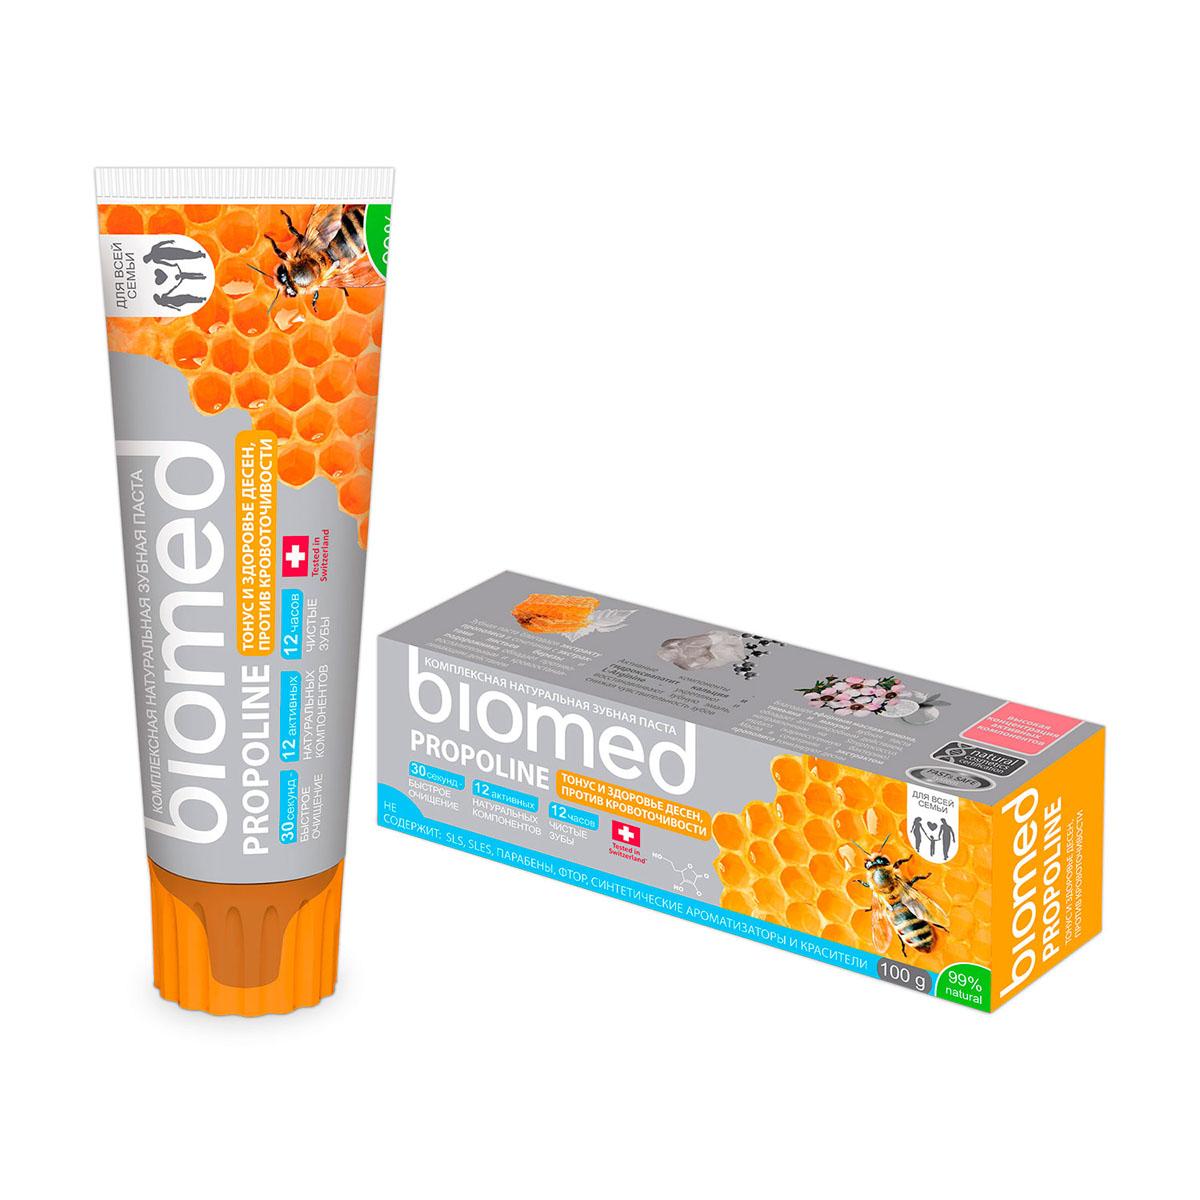 Biomed Зубная паста Propoline / Прополис, 100 г ароматизаторы